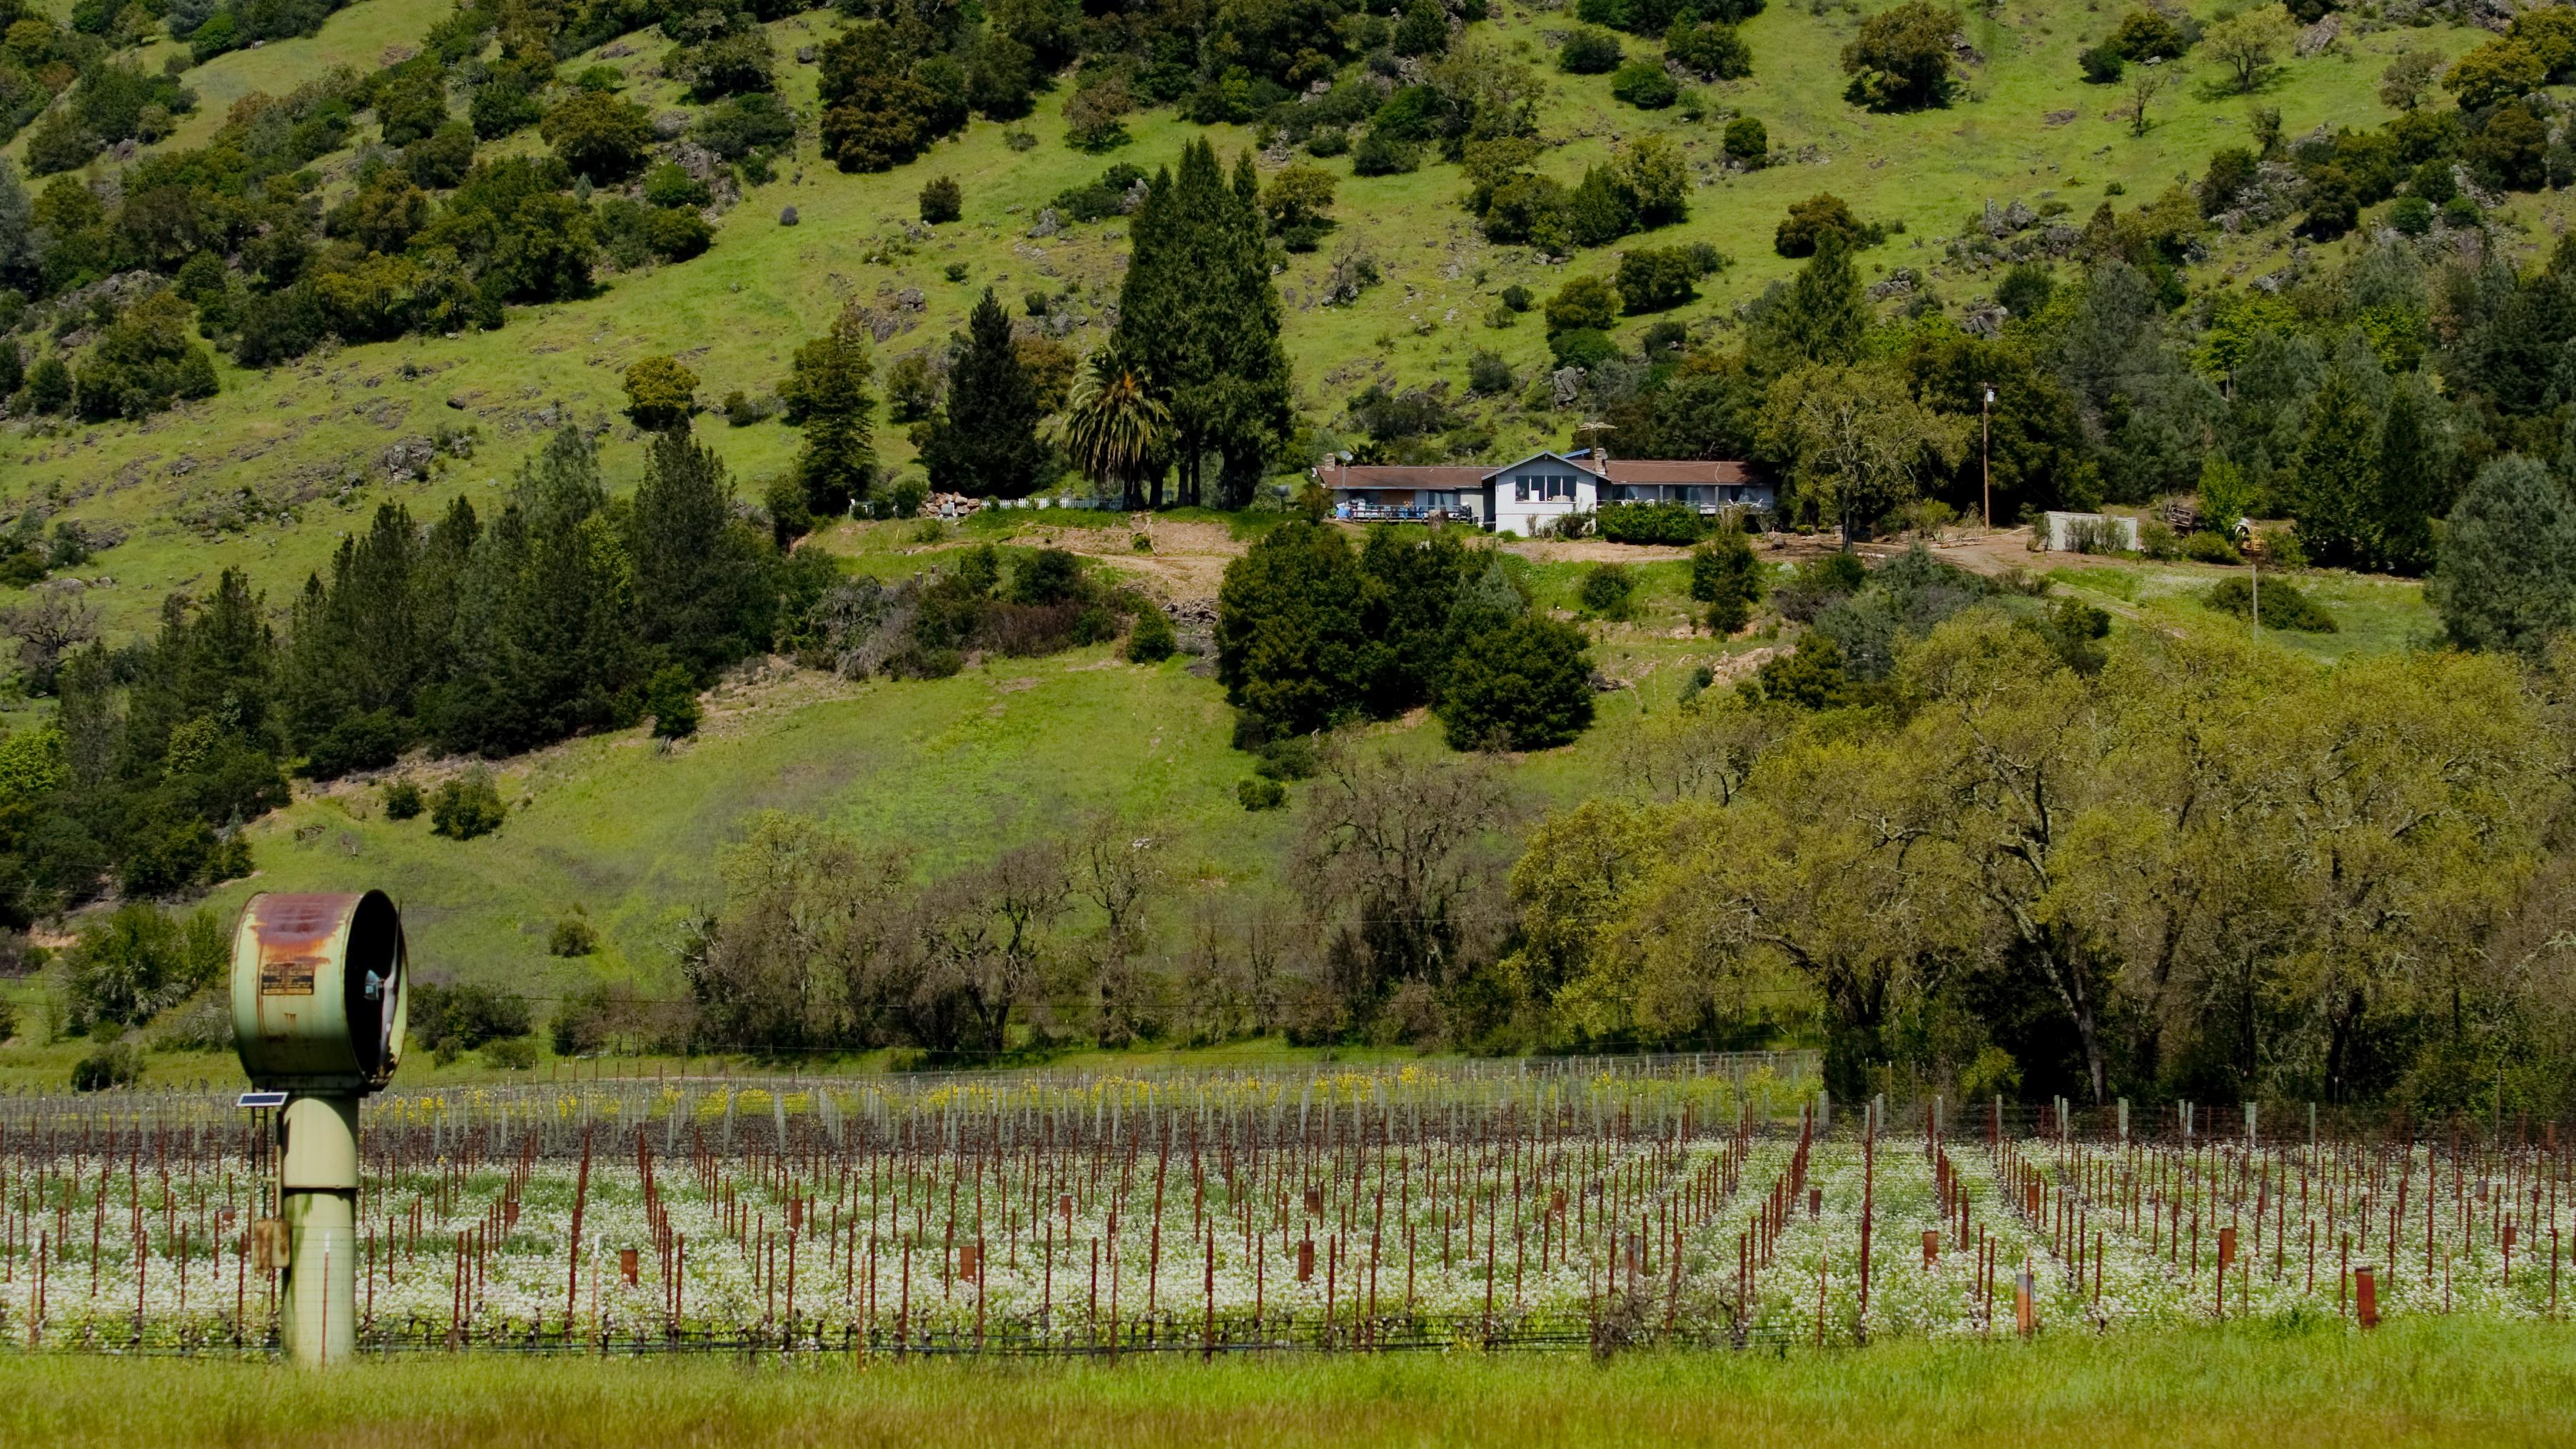 加州酒莊 (Napa Valley and Central Coast)   美西夢幻海岸及國家公園之旅